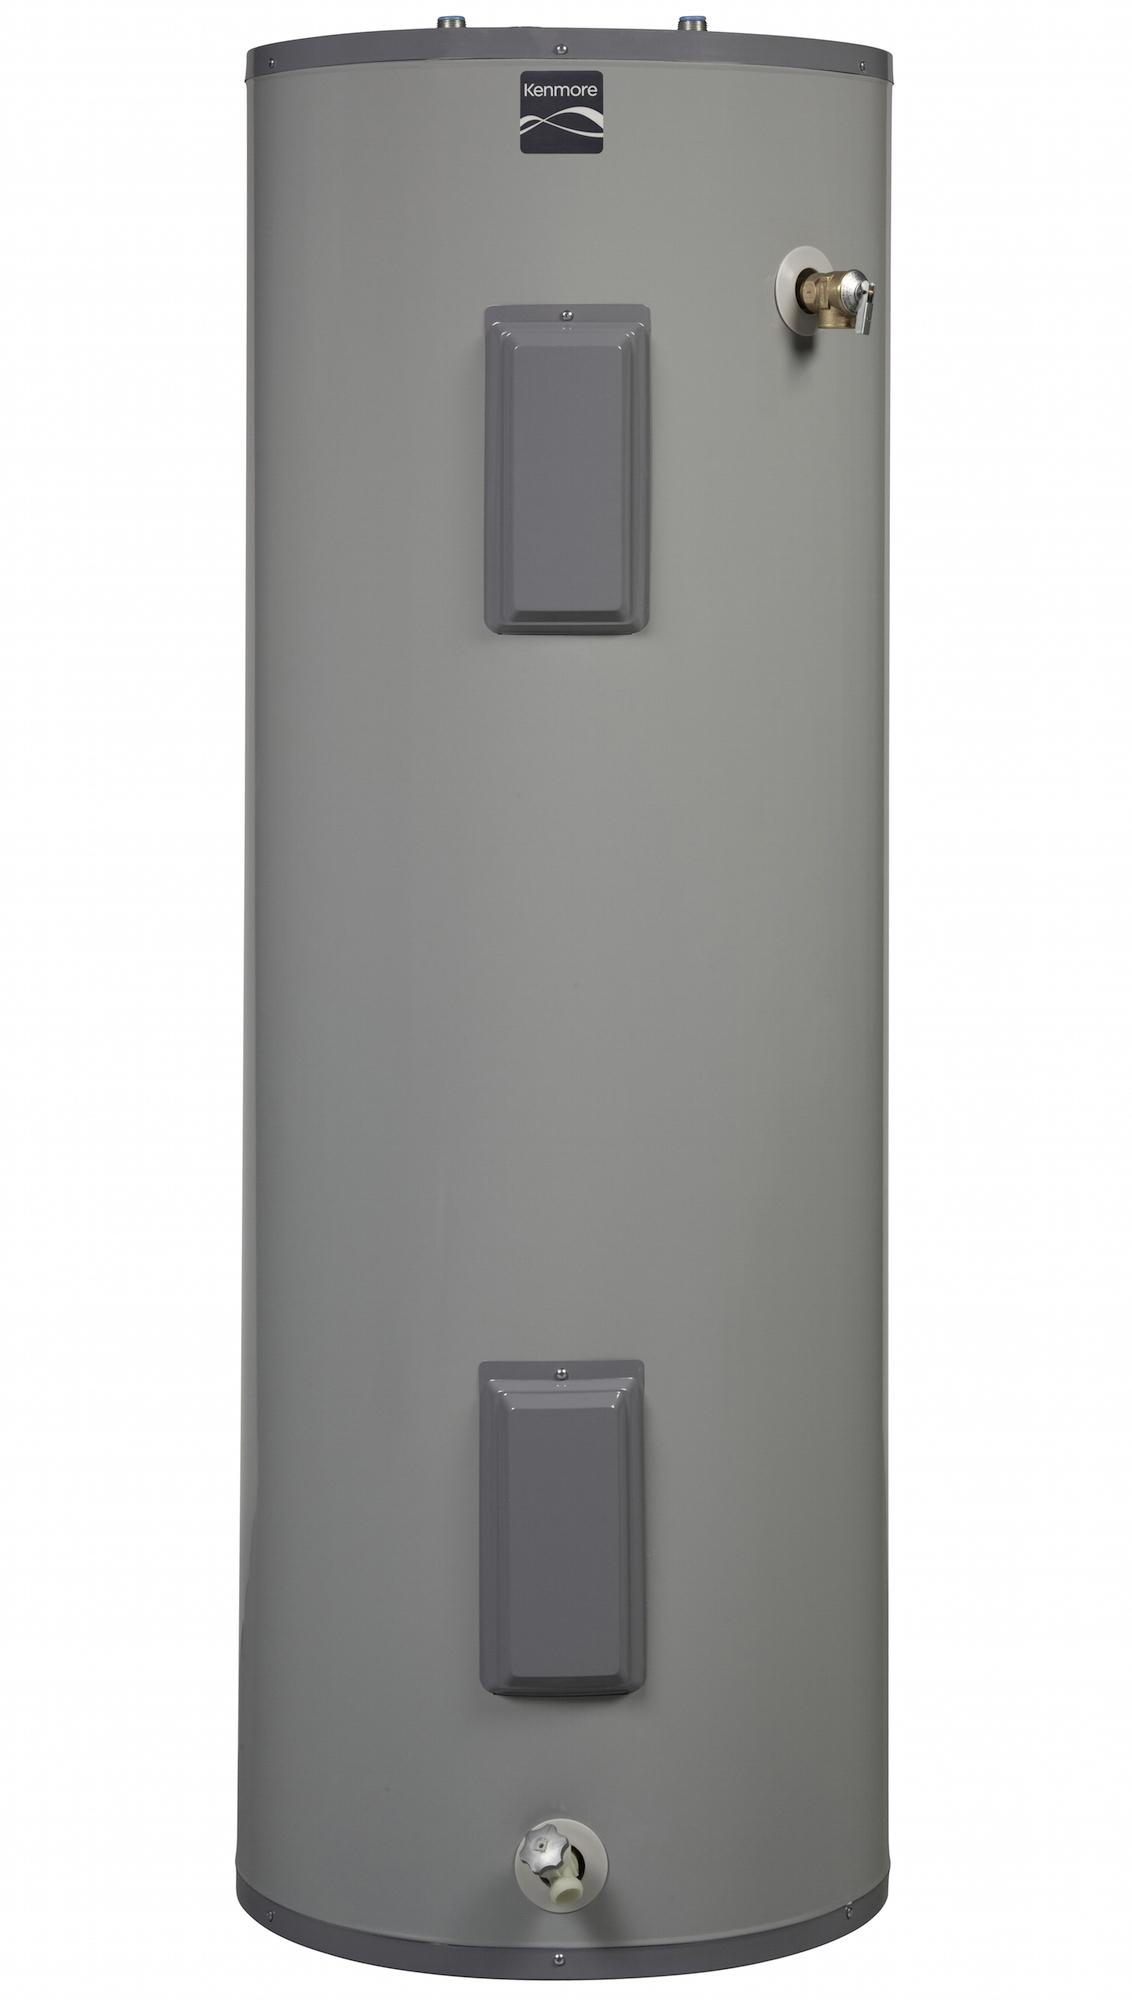 kenmore hot water heater wiring diagram volvo diagrams 240 whirlpool 50 gal electric